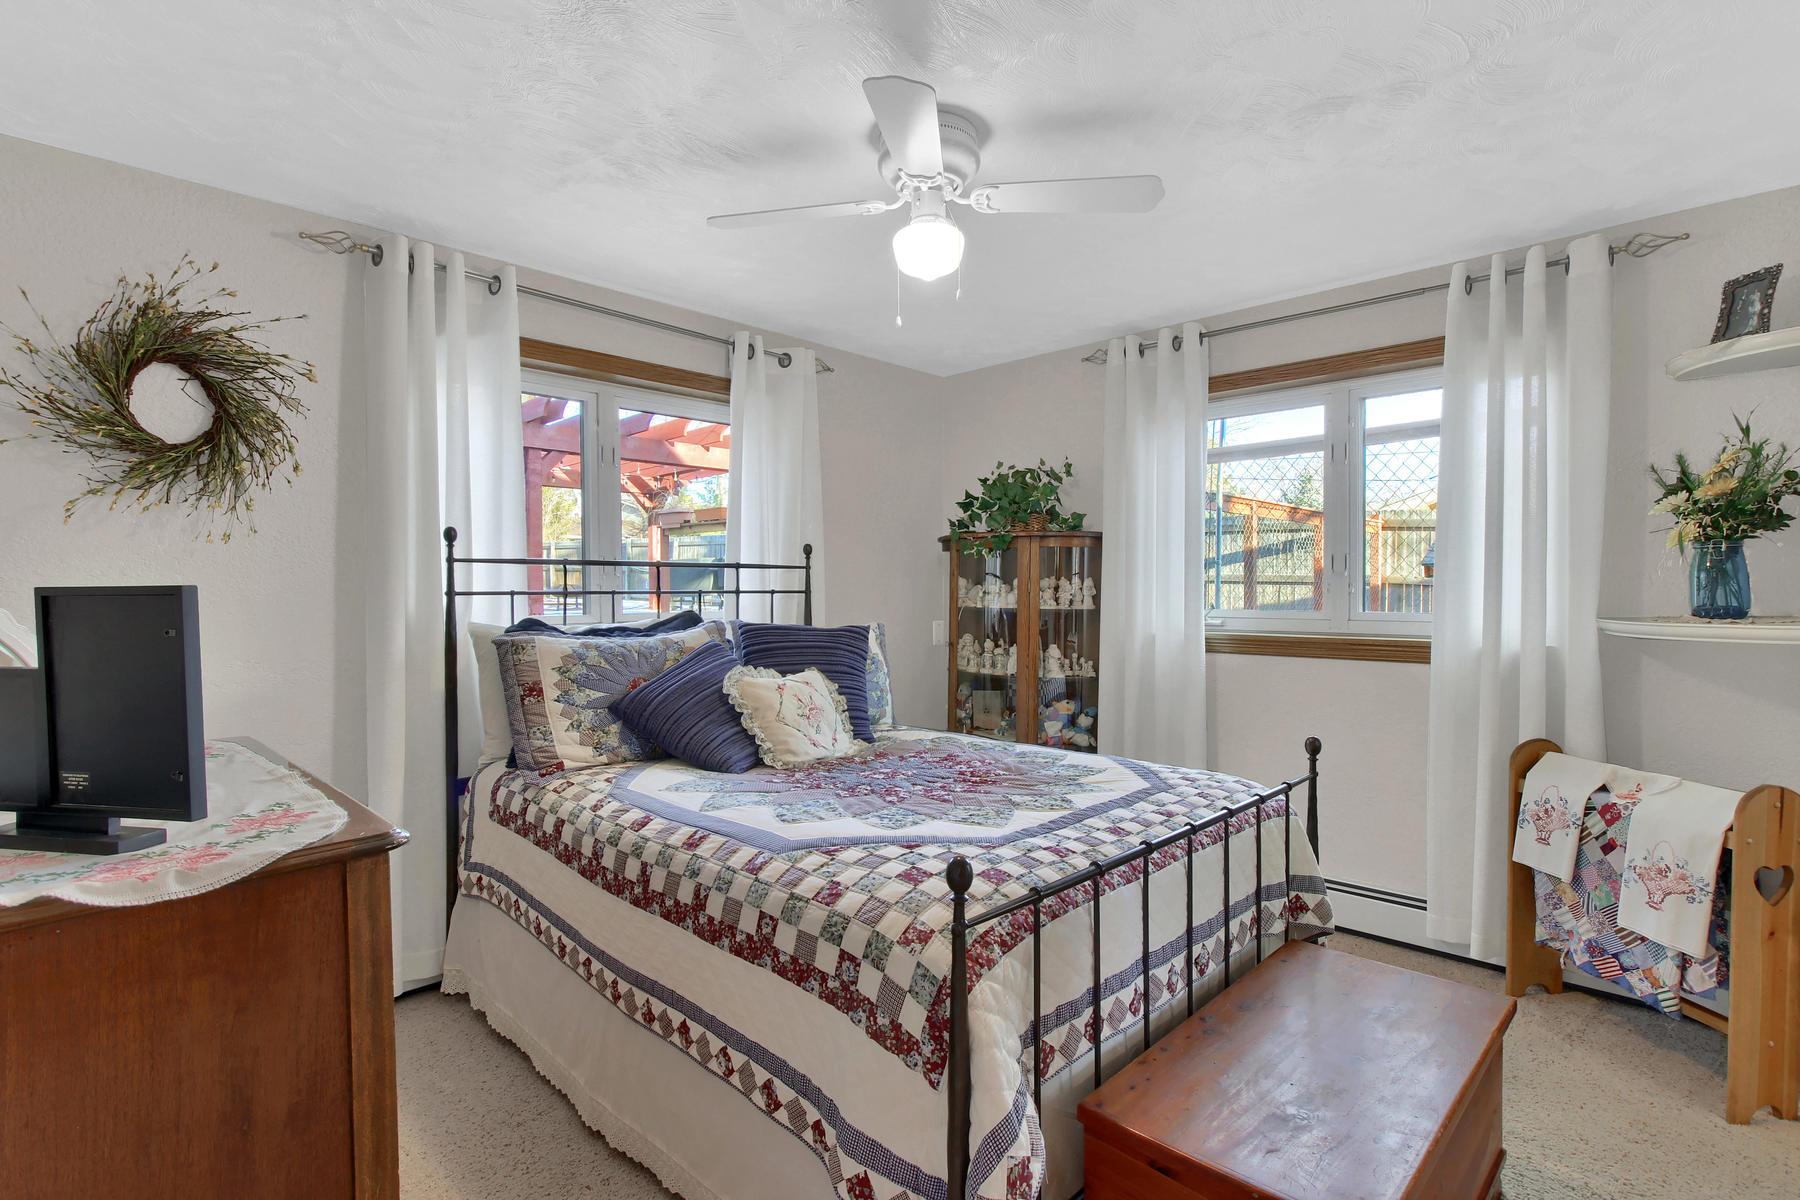 11415 W 76th Way Arvada CO-039-30-Bedroom-MLS_Size.jpg